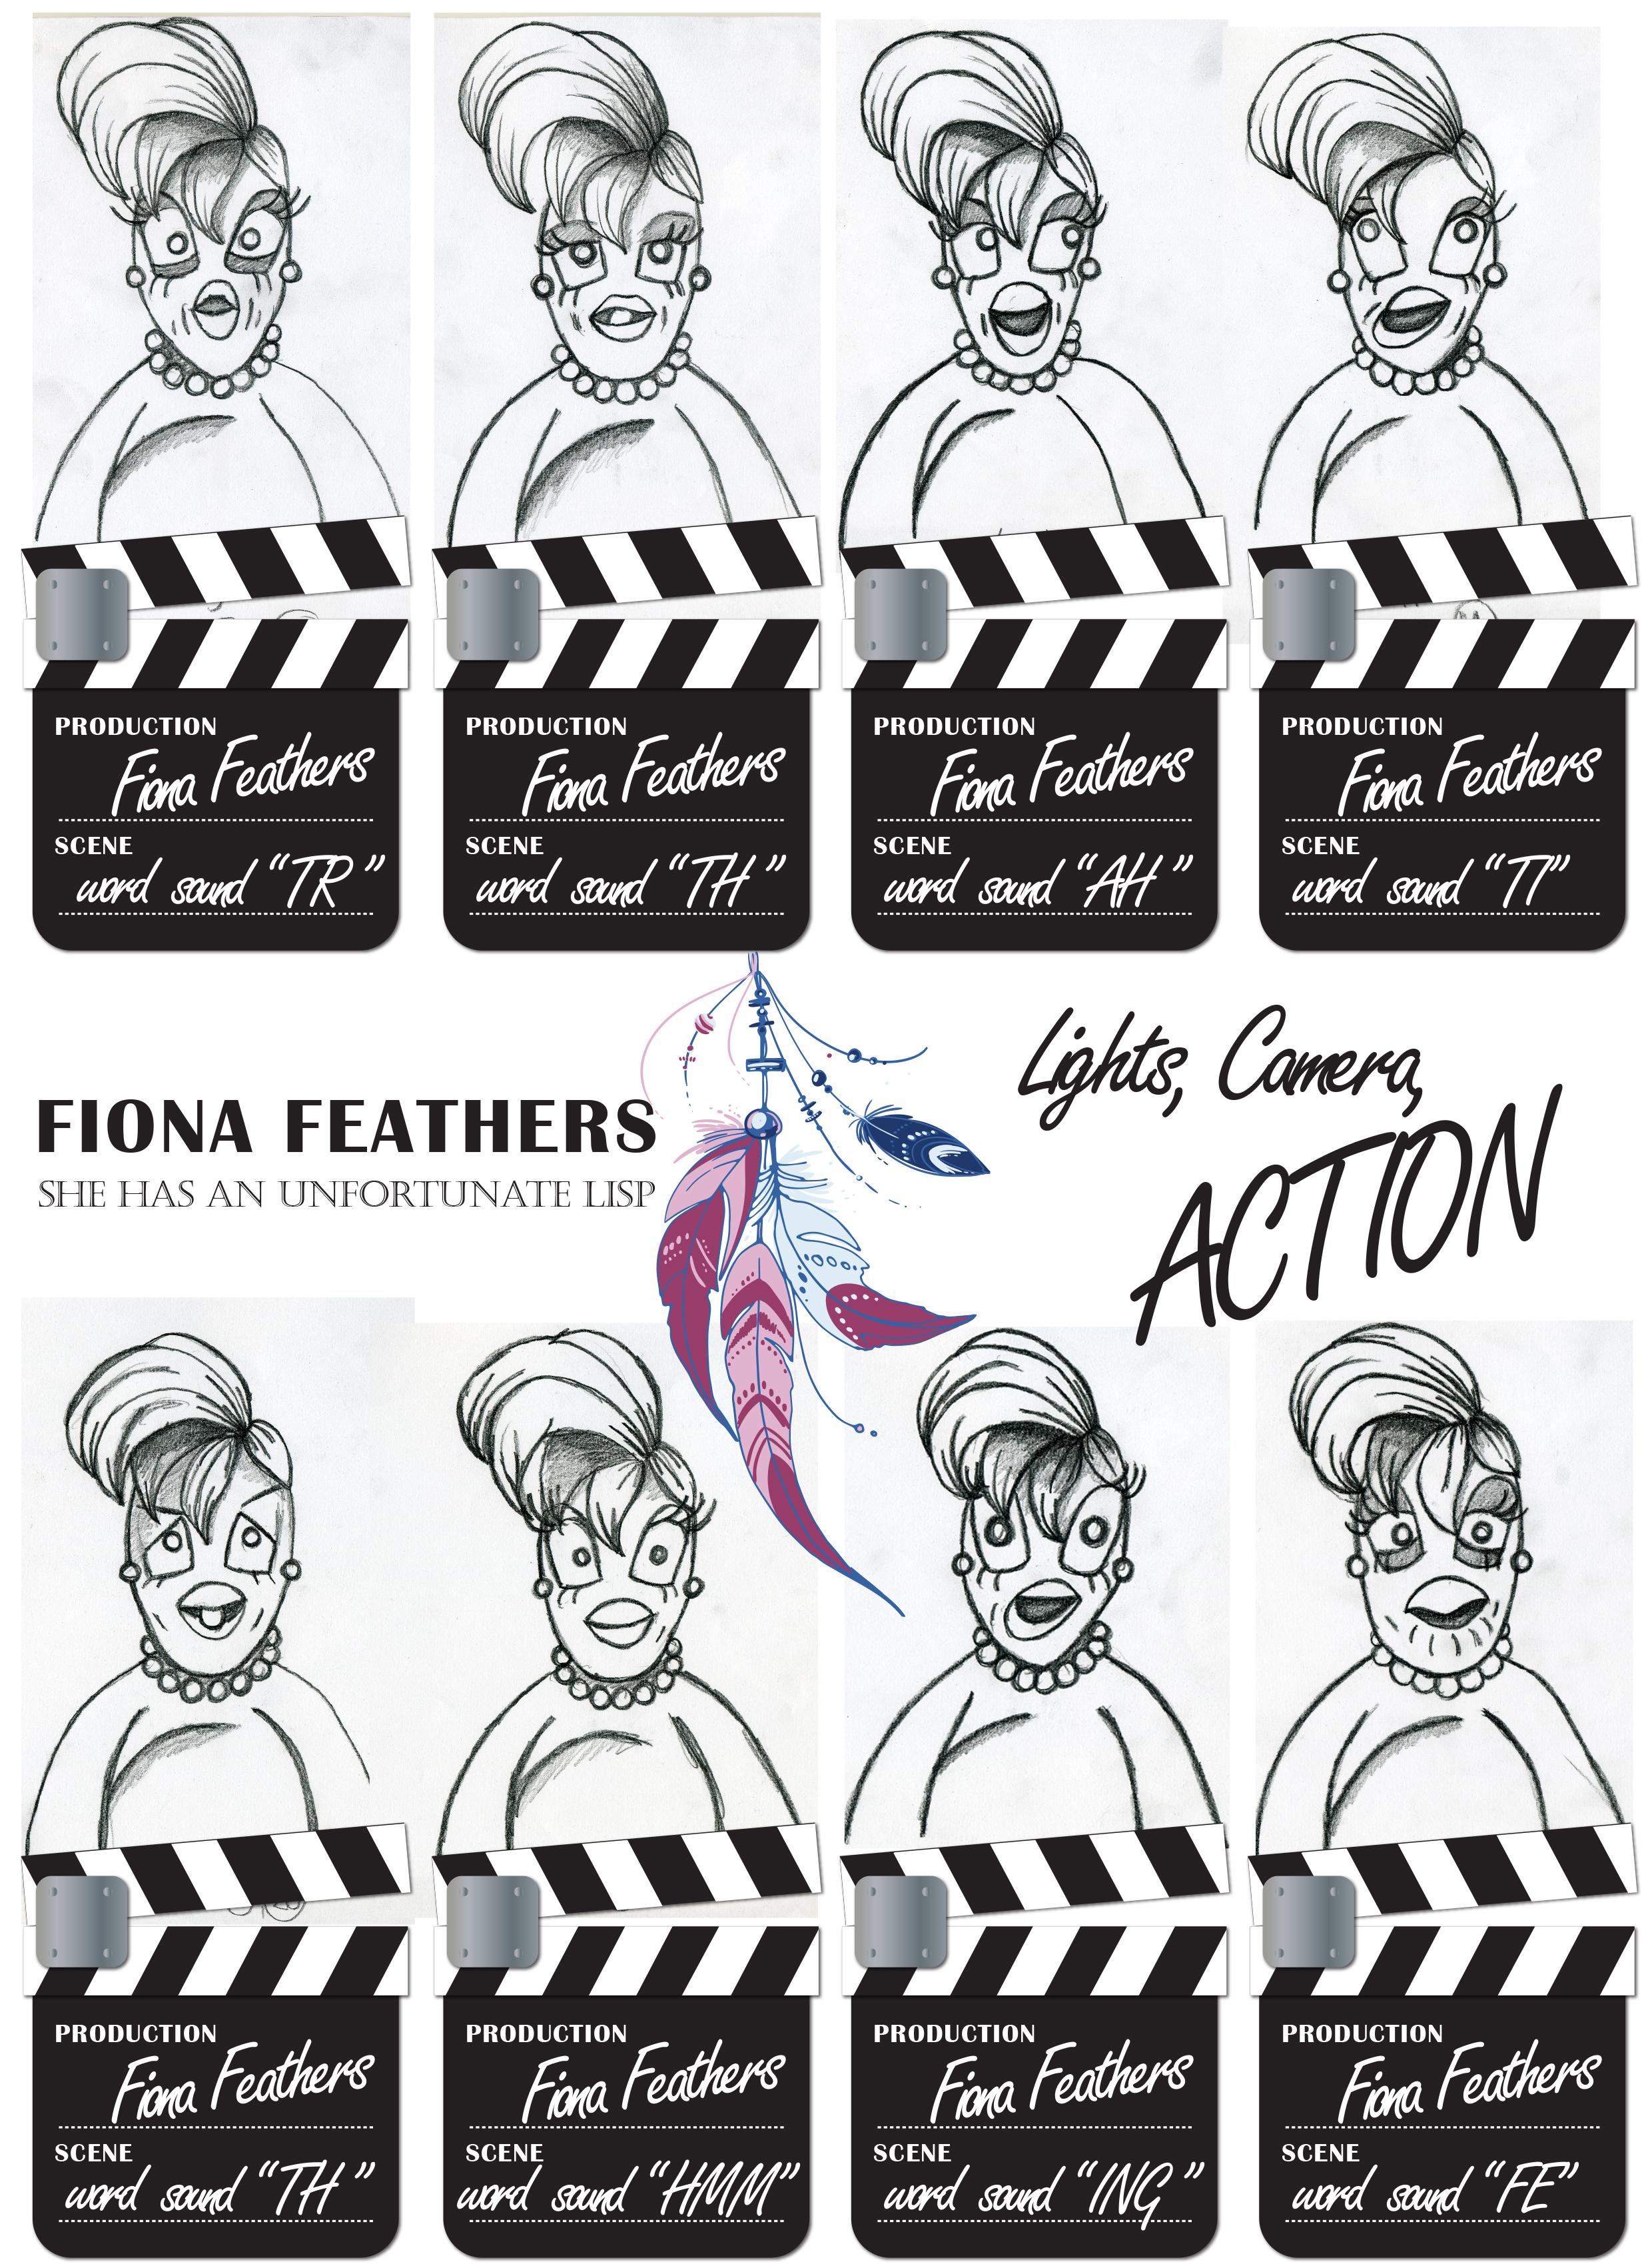 Fiona Feathers